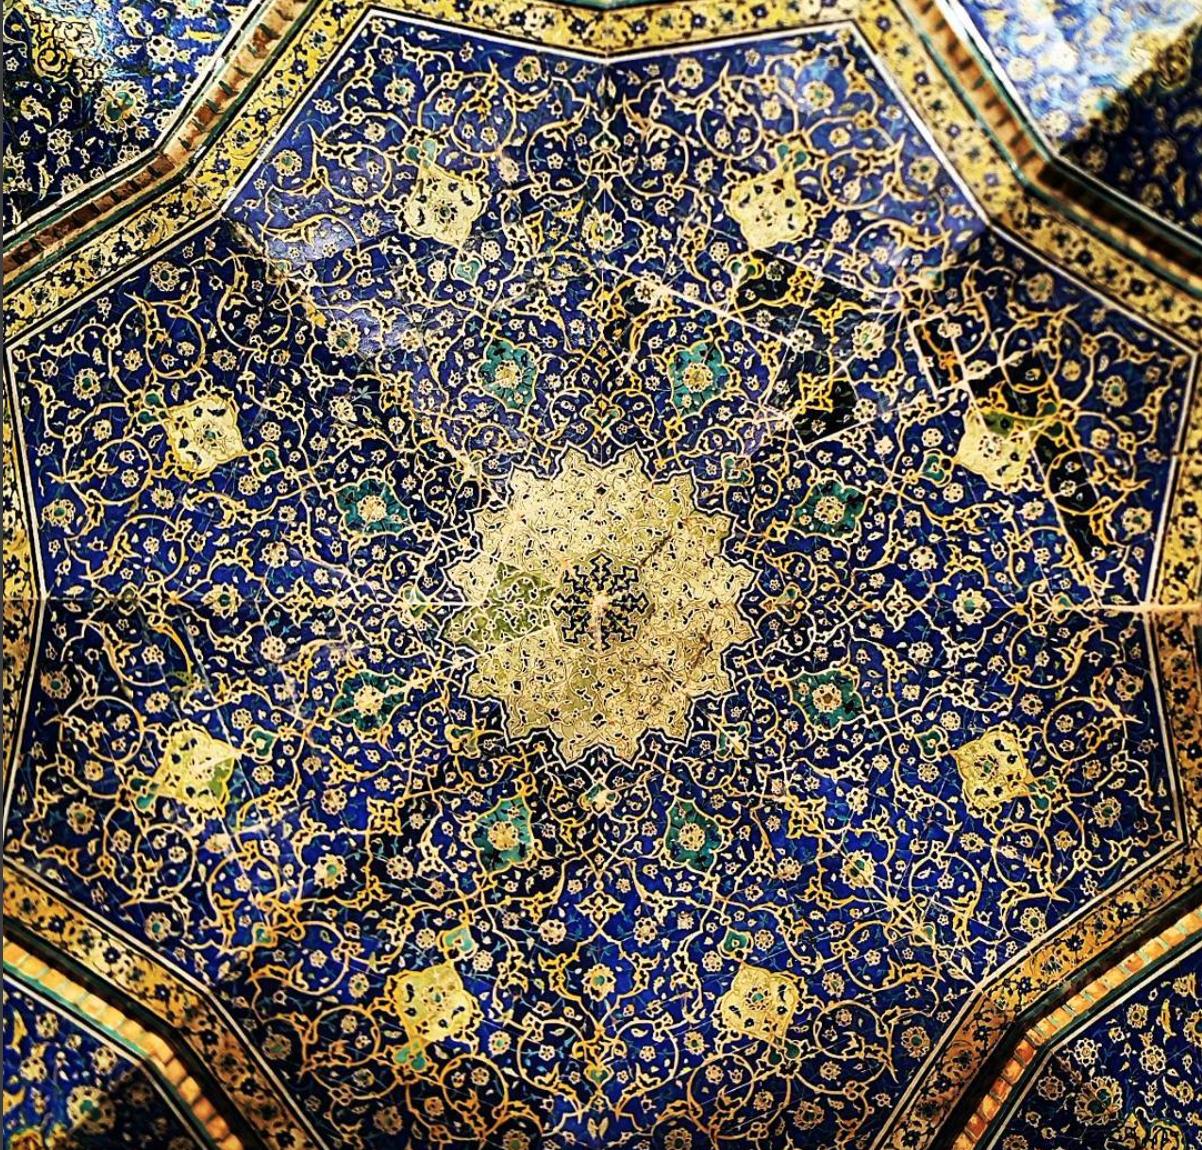 Iranian Mosque, by Mehrdad Rasoulifard